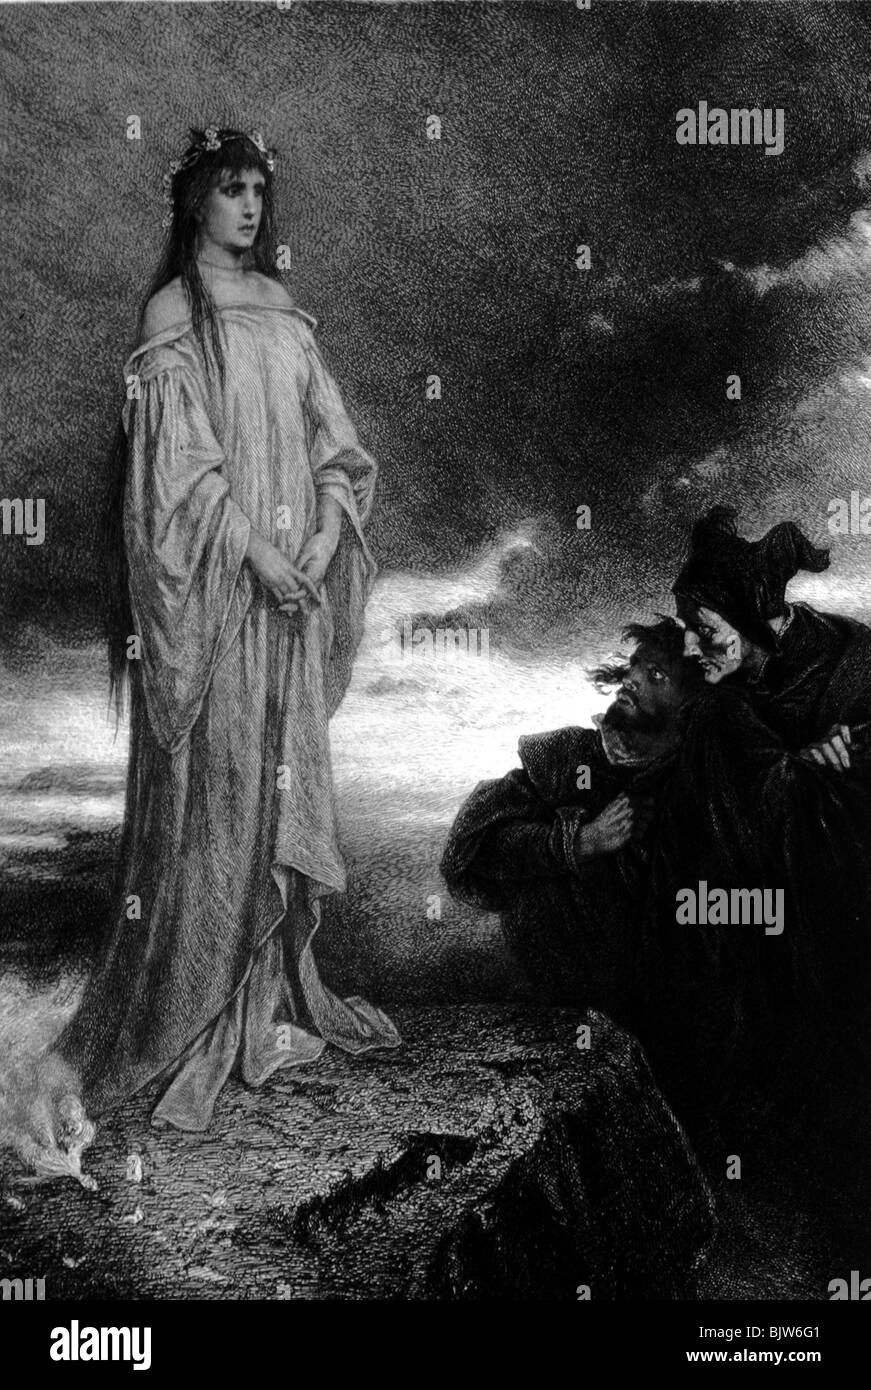 literature, 'Faust I', 22th scene 'Walpurgisnight', appearance,  wood engraving by Liezen Mayer, - Stock Image